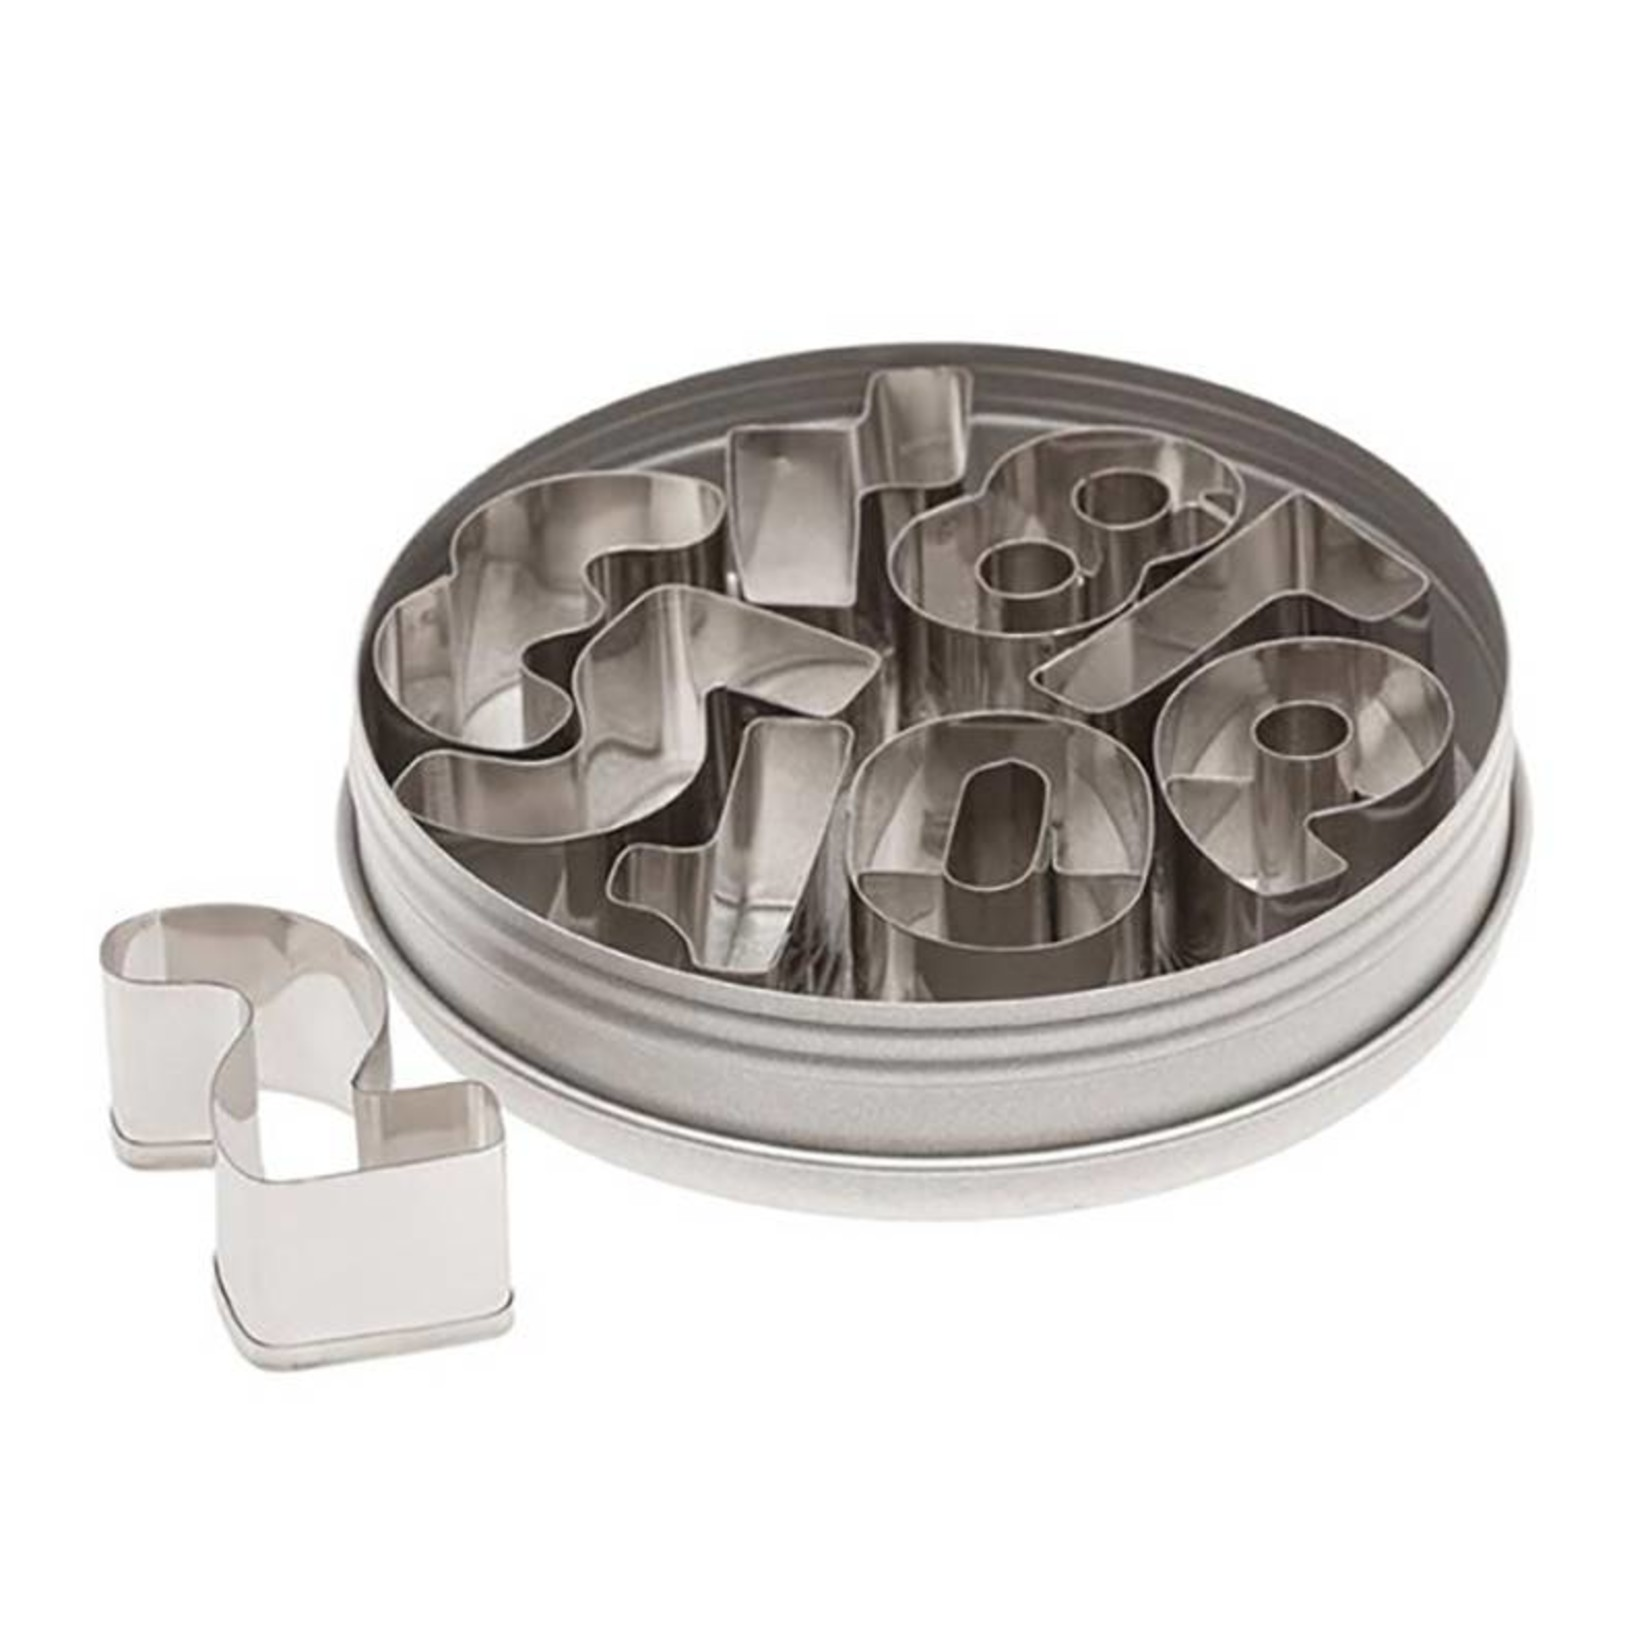 Ateco Ateco - Number Cutter Set - 1.5'', 7802